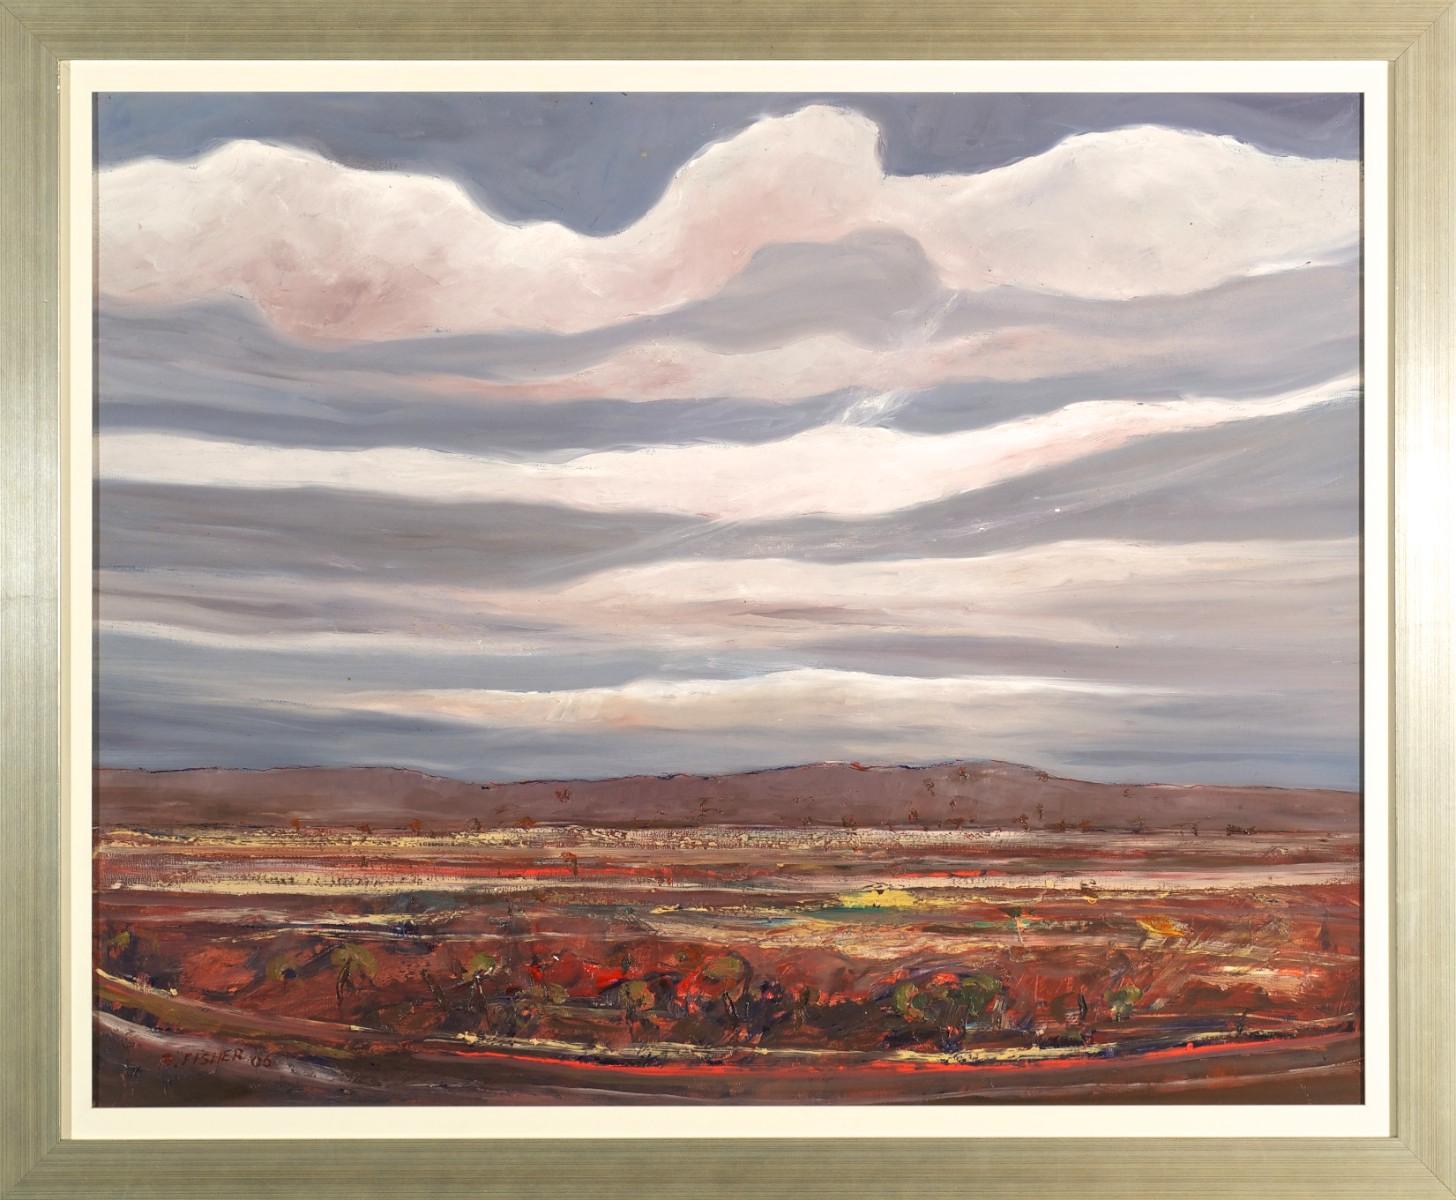 Robert Fisher. Davenport Ranges, Geologist Trek. Oil on Board. 95cm x 115cm